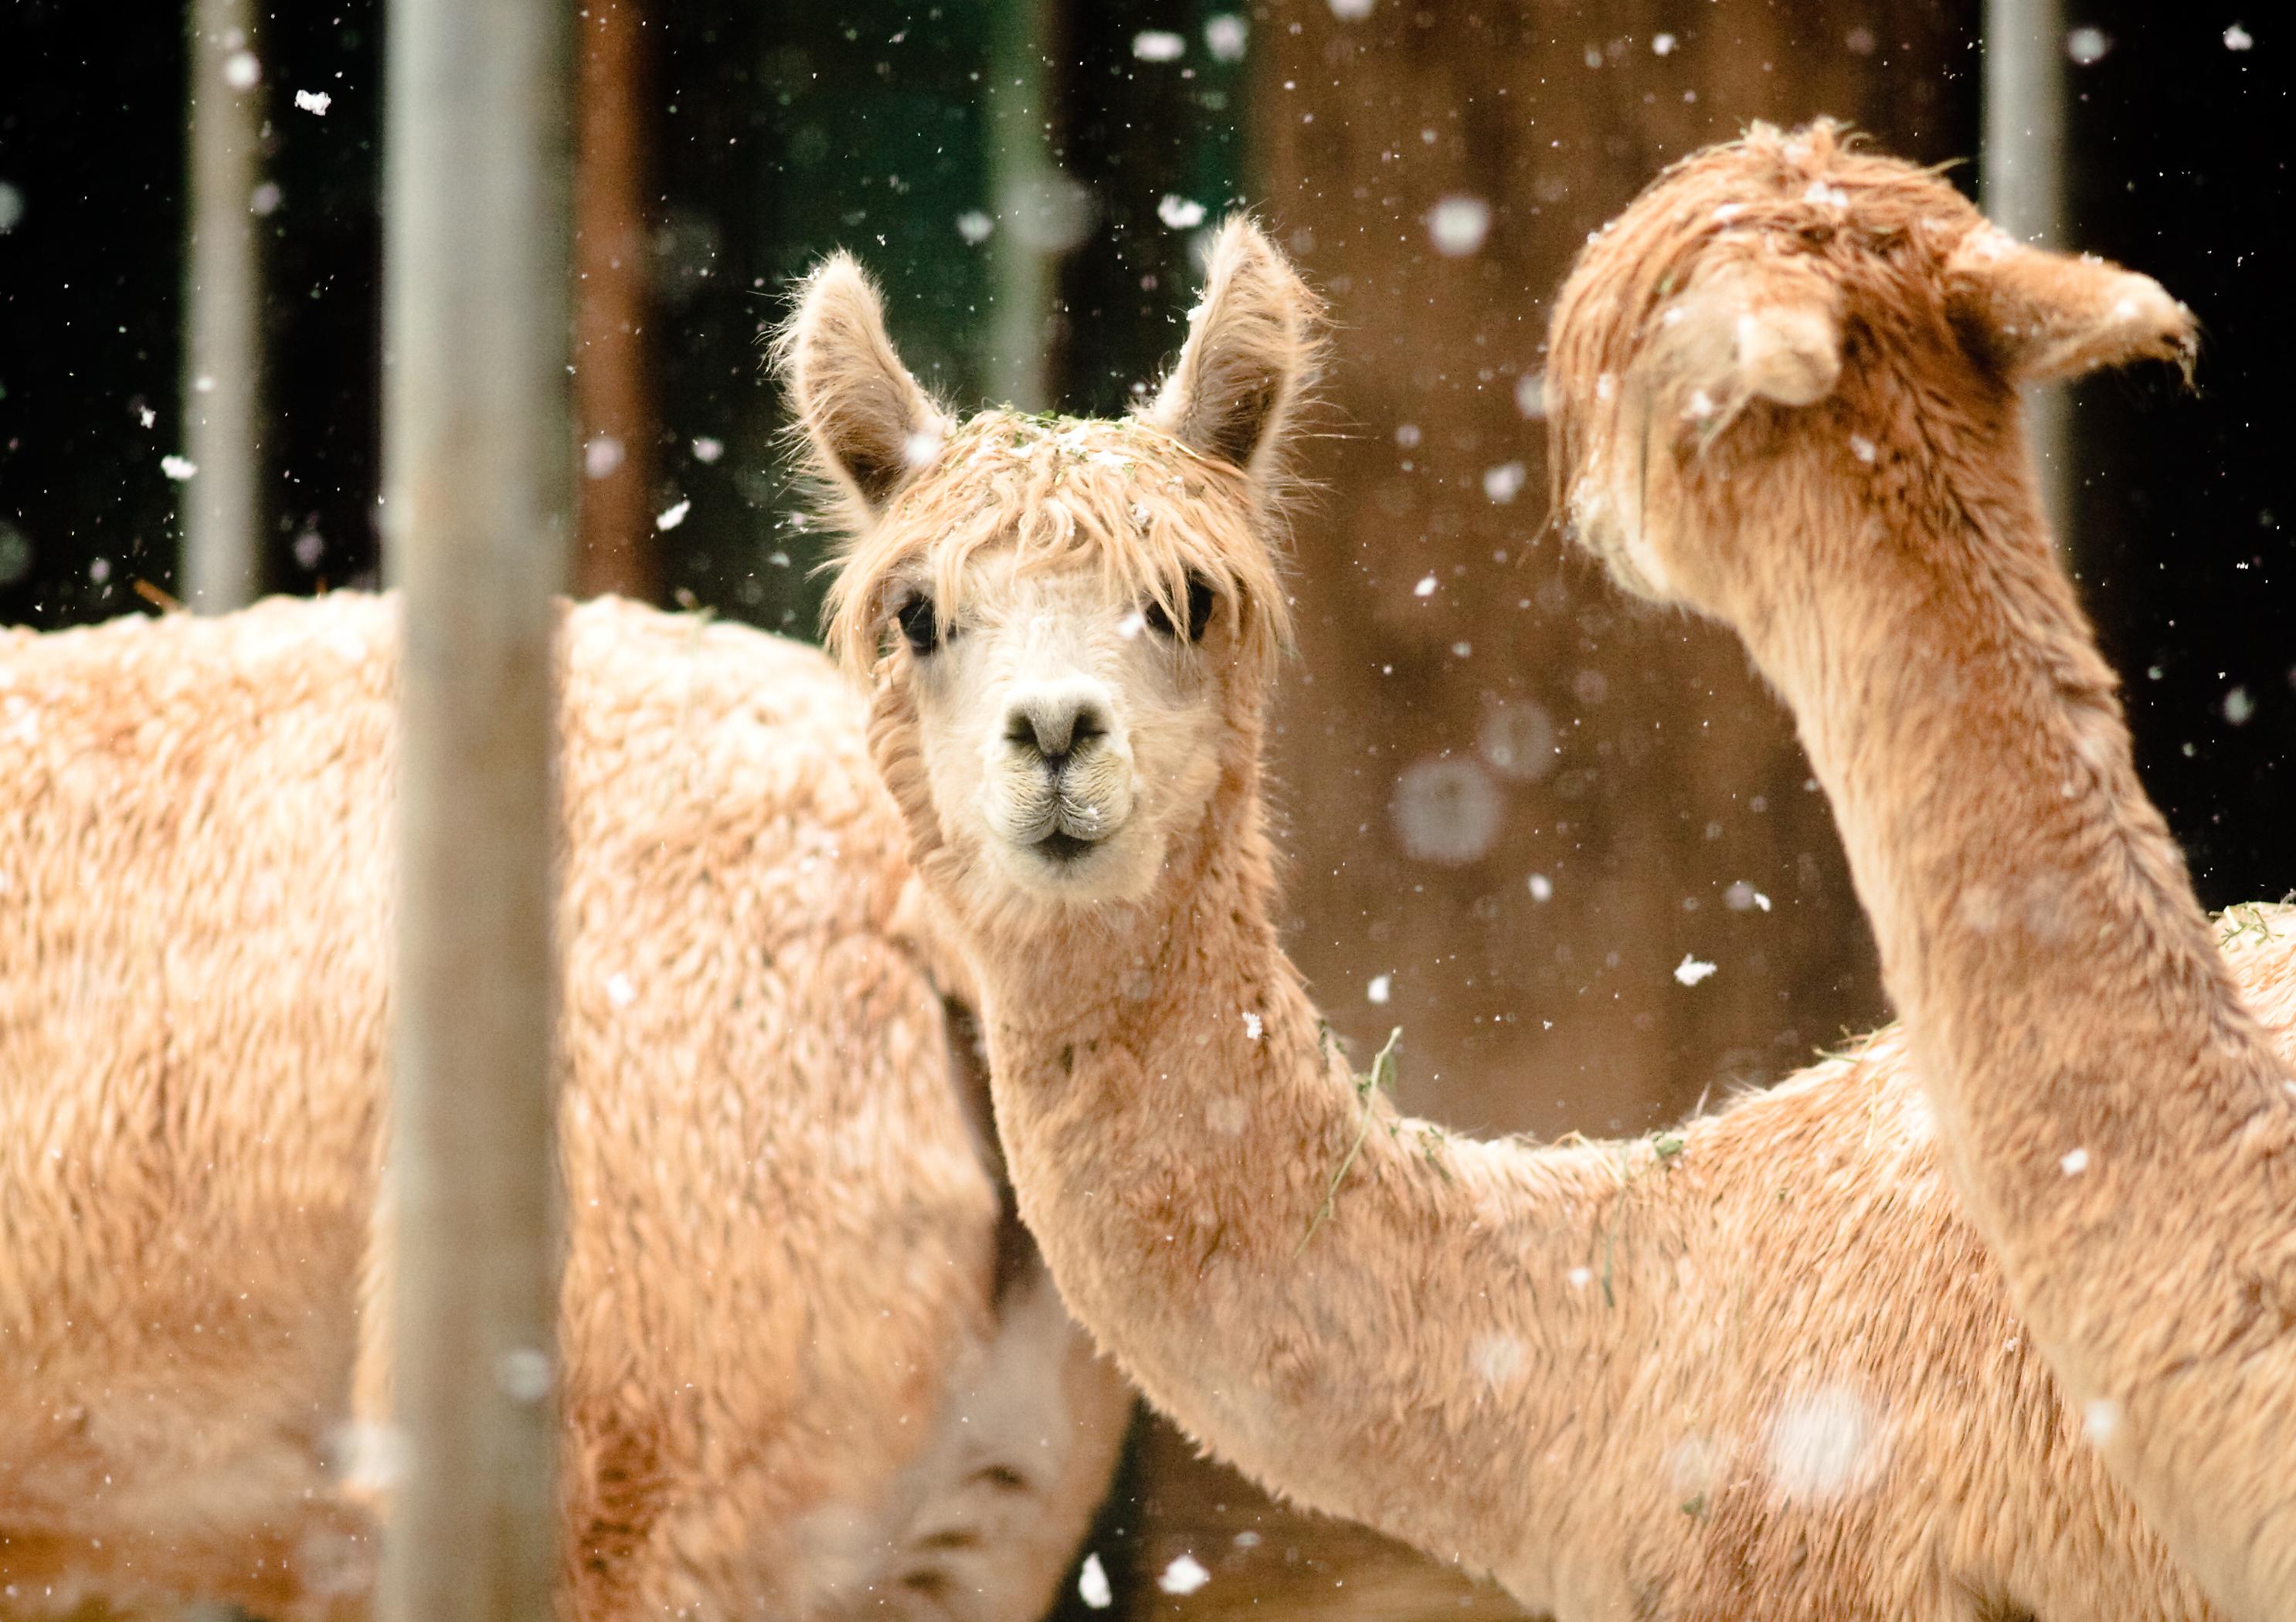 alpacas_in_the_snow_28389931937629